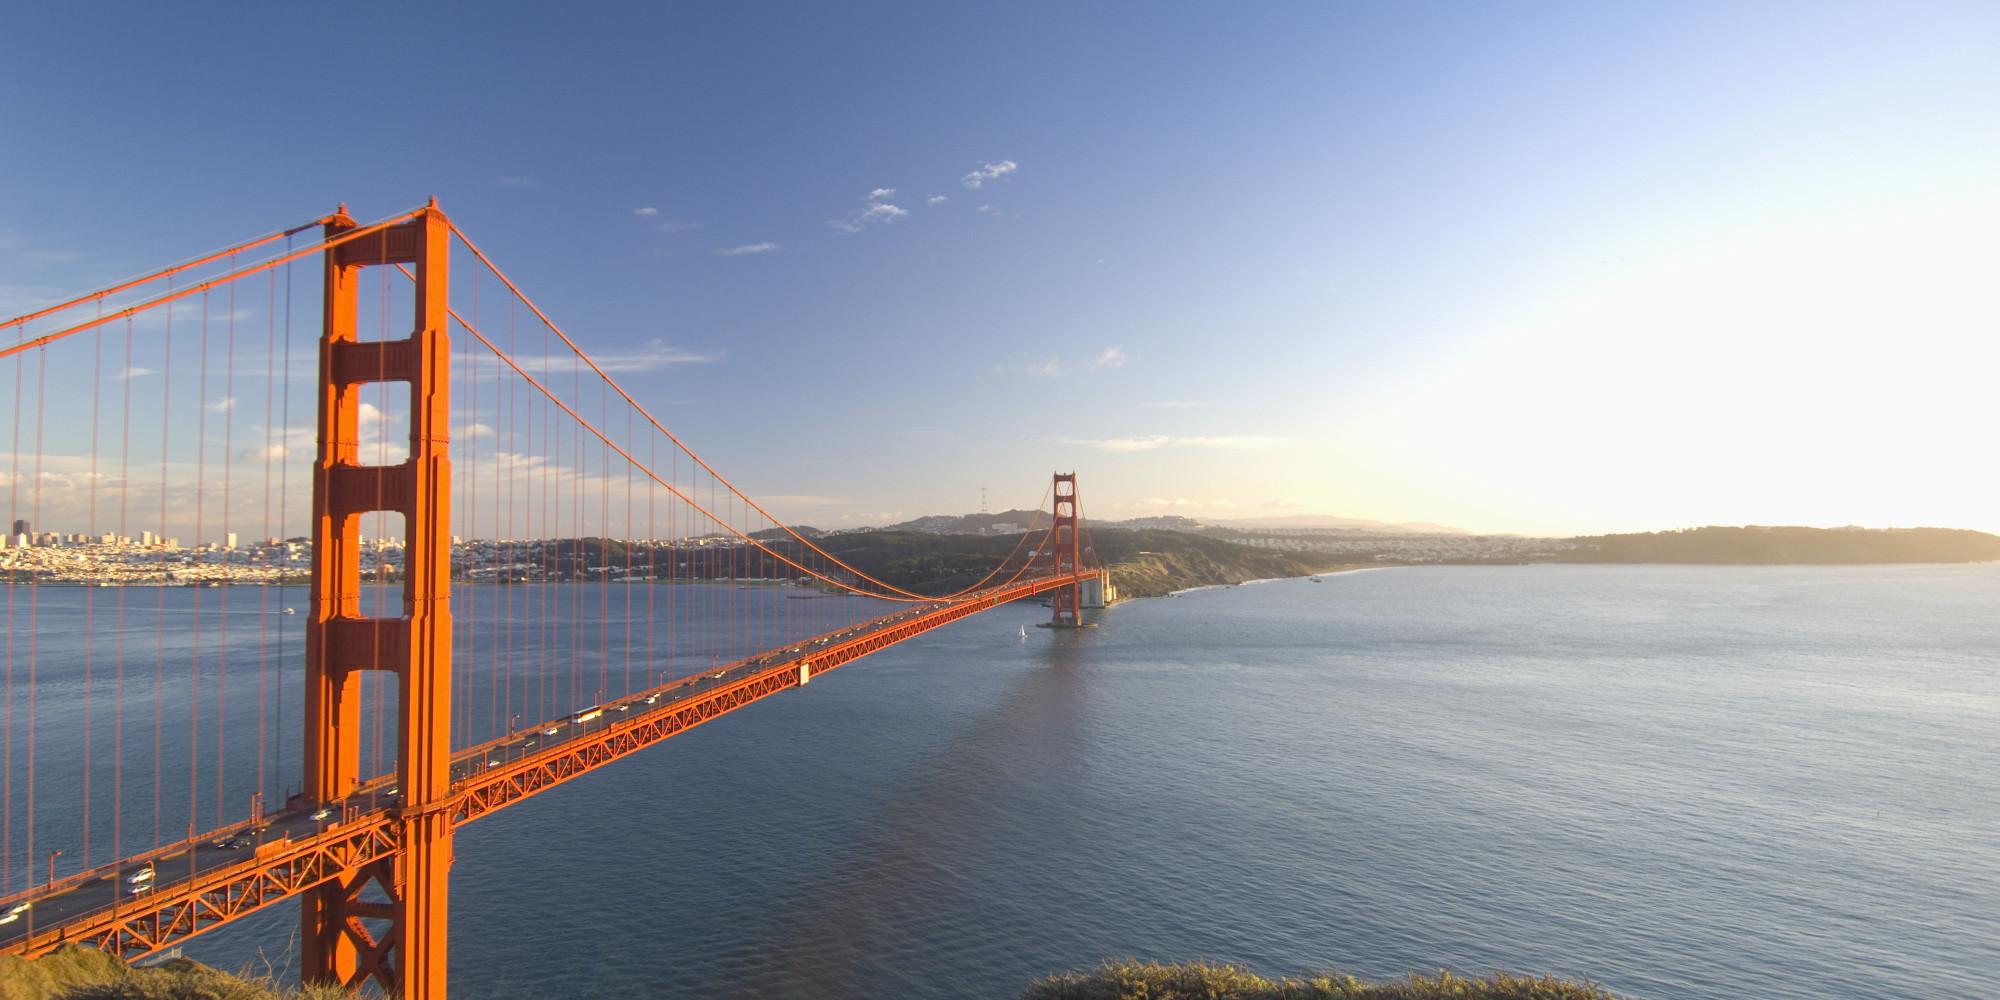 Fall in Love: Romantic Dates Near San Francisco | HuffPost